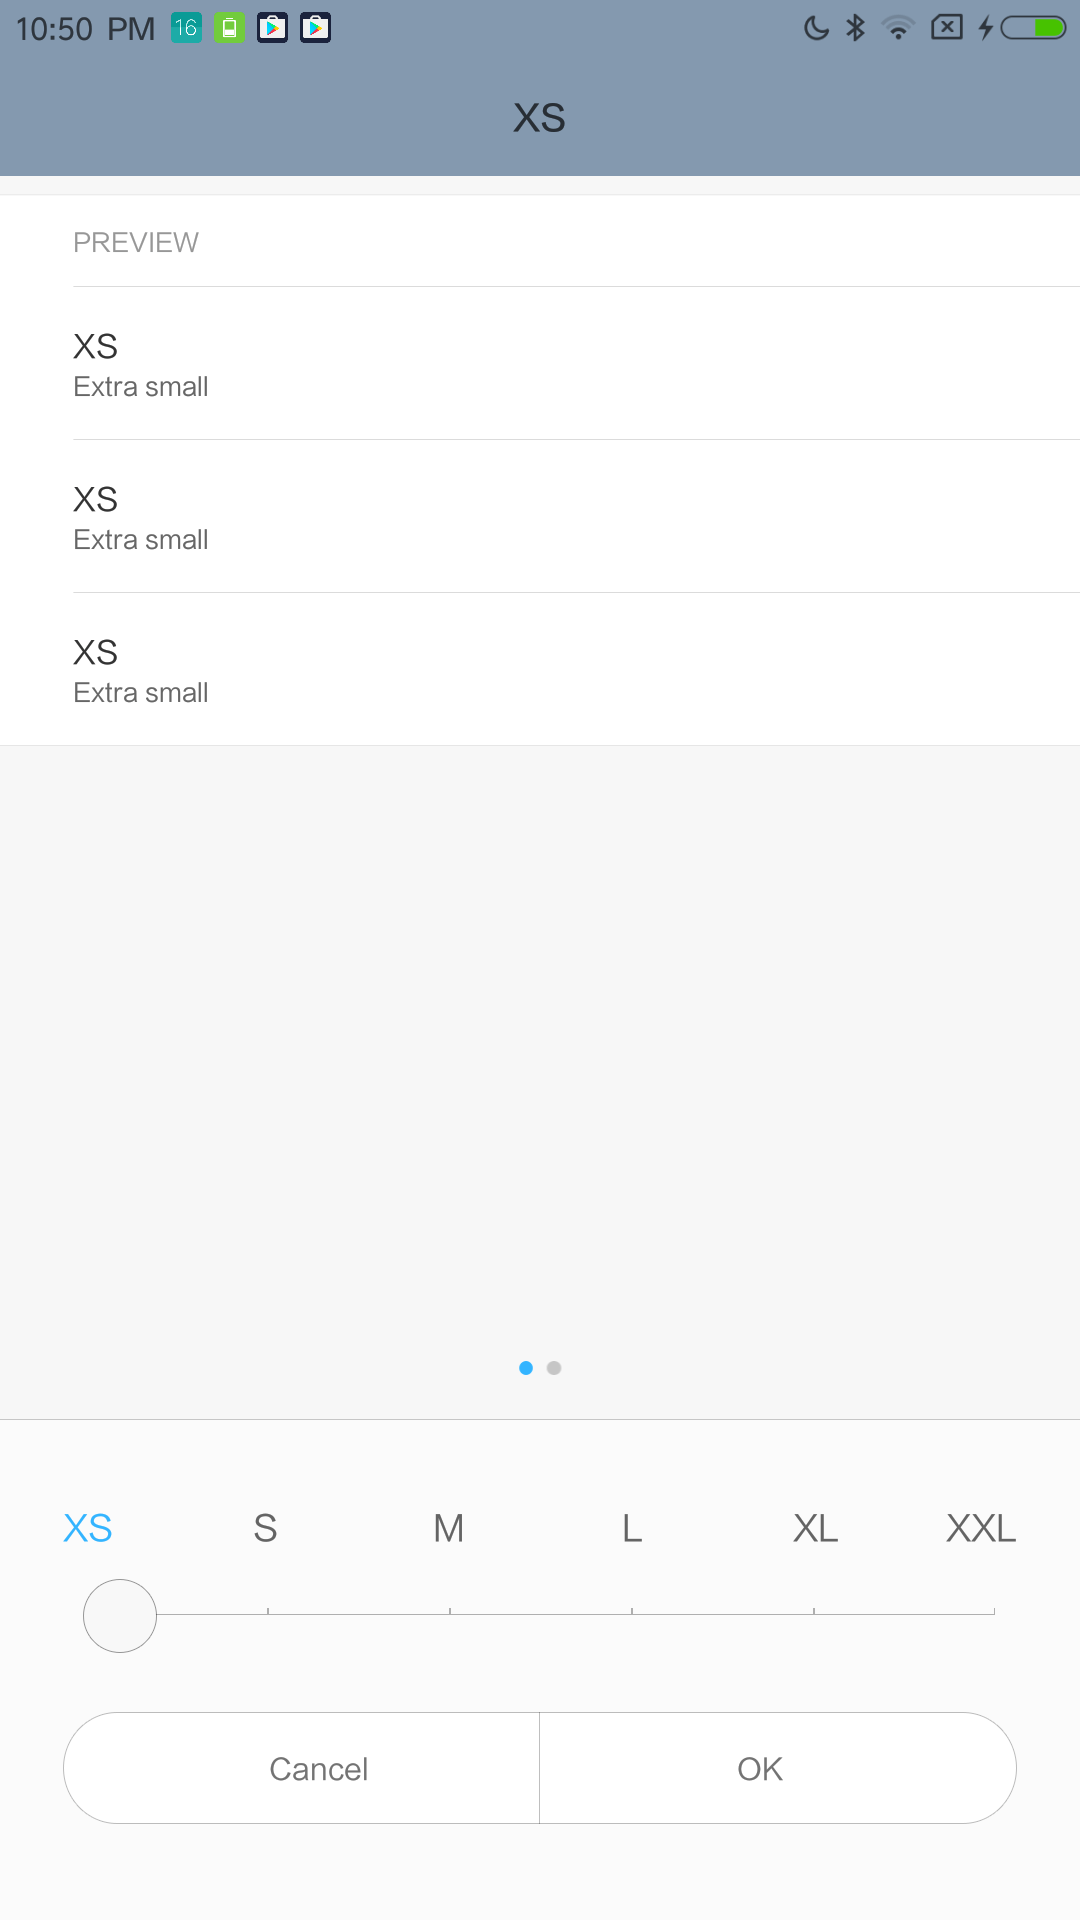 Xiaomi Mi MIX AH NS Screenshots display 3